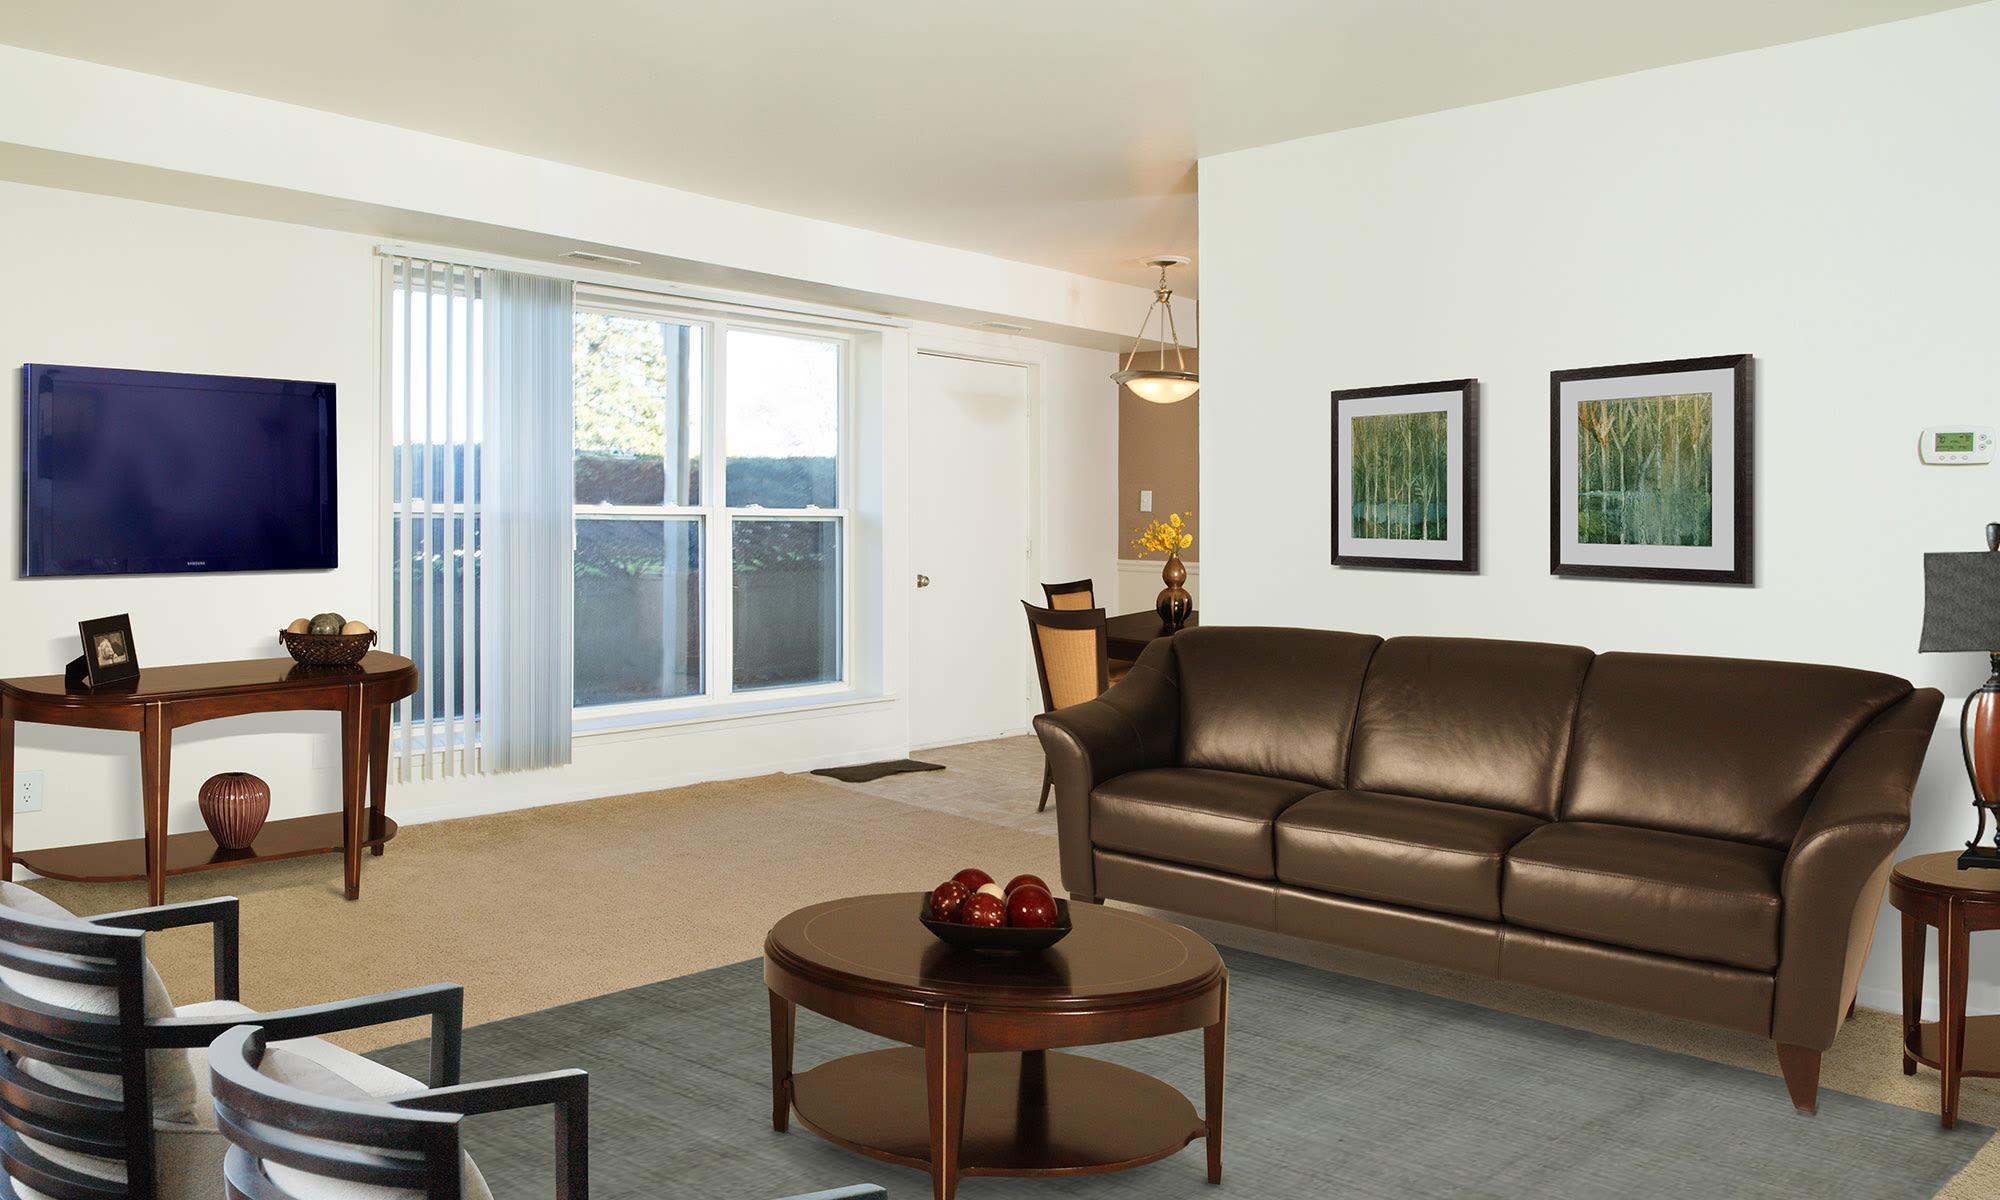 Apartments in Niskayuna, New York